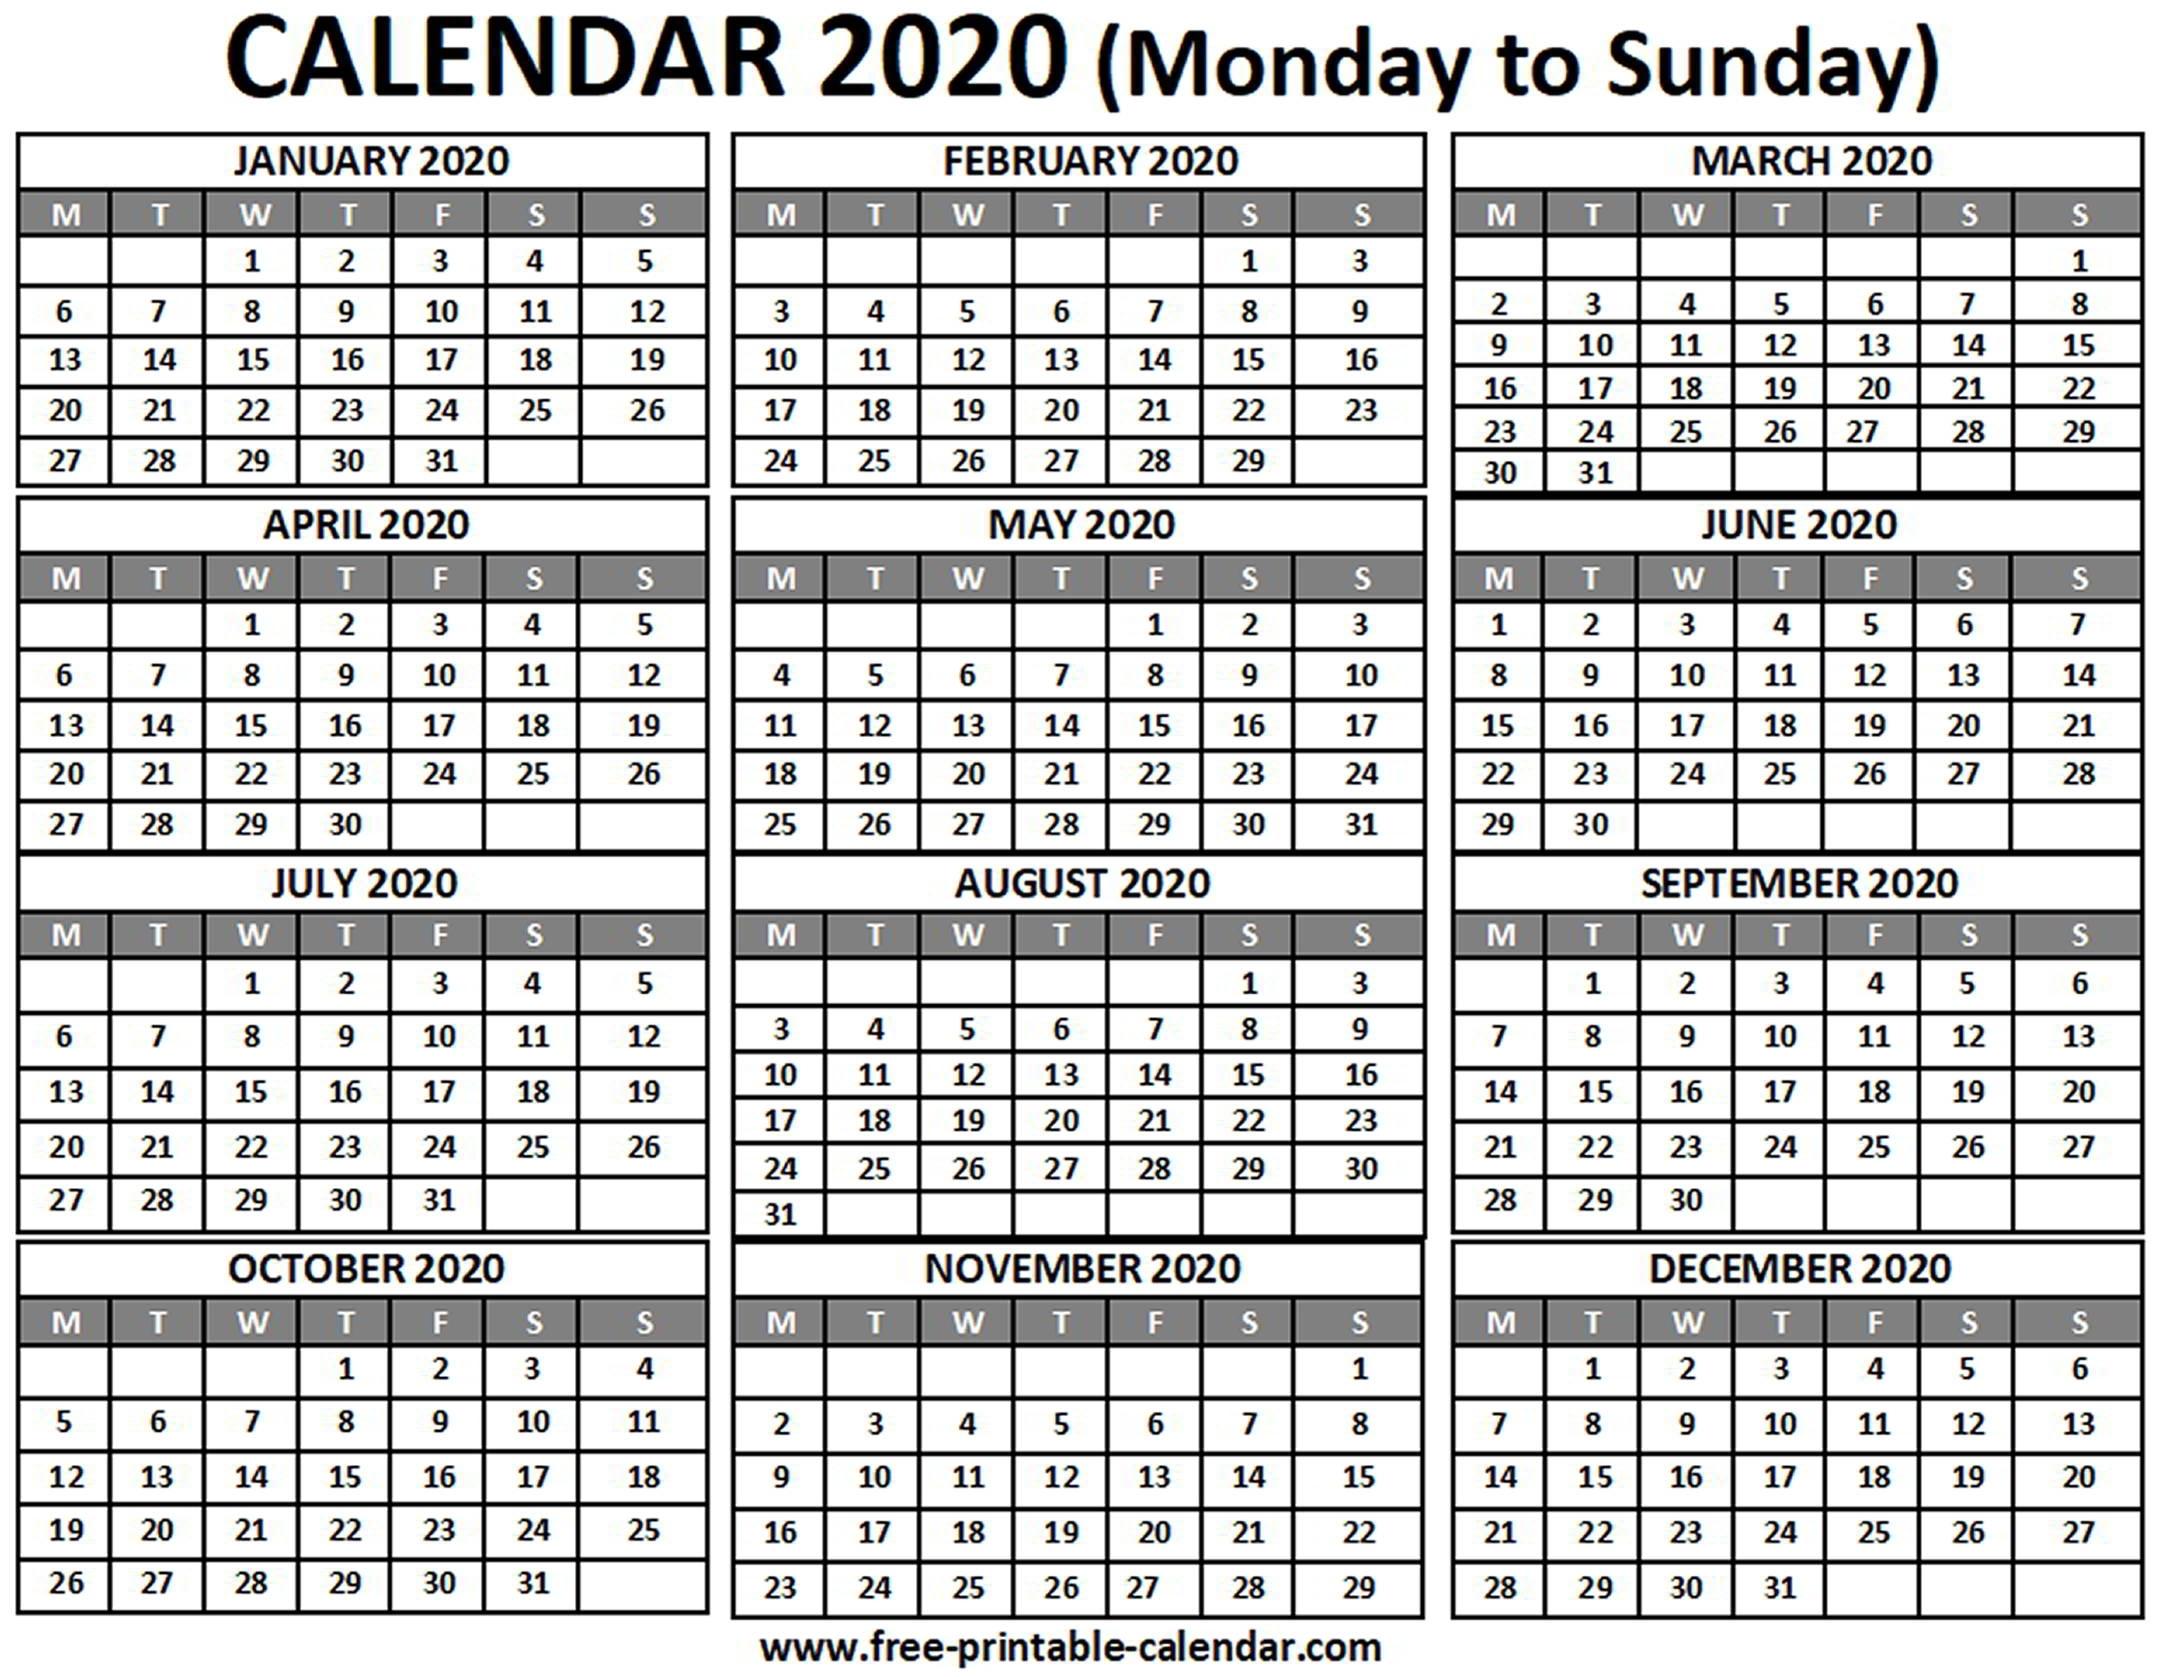 2020 Calendar - Free-Printable-Calendar inside Printable Calendar 2020 Monday Start